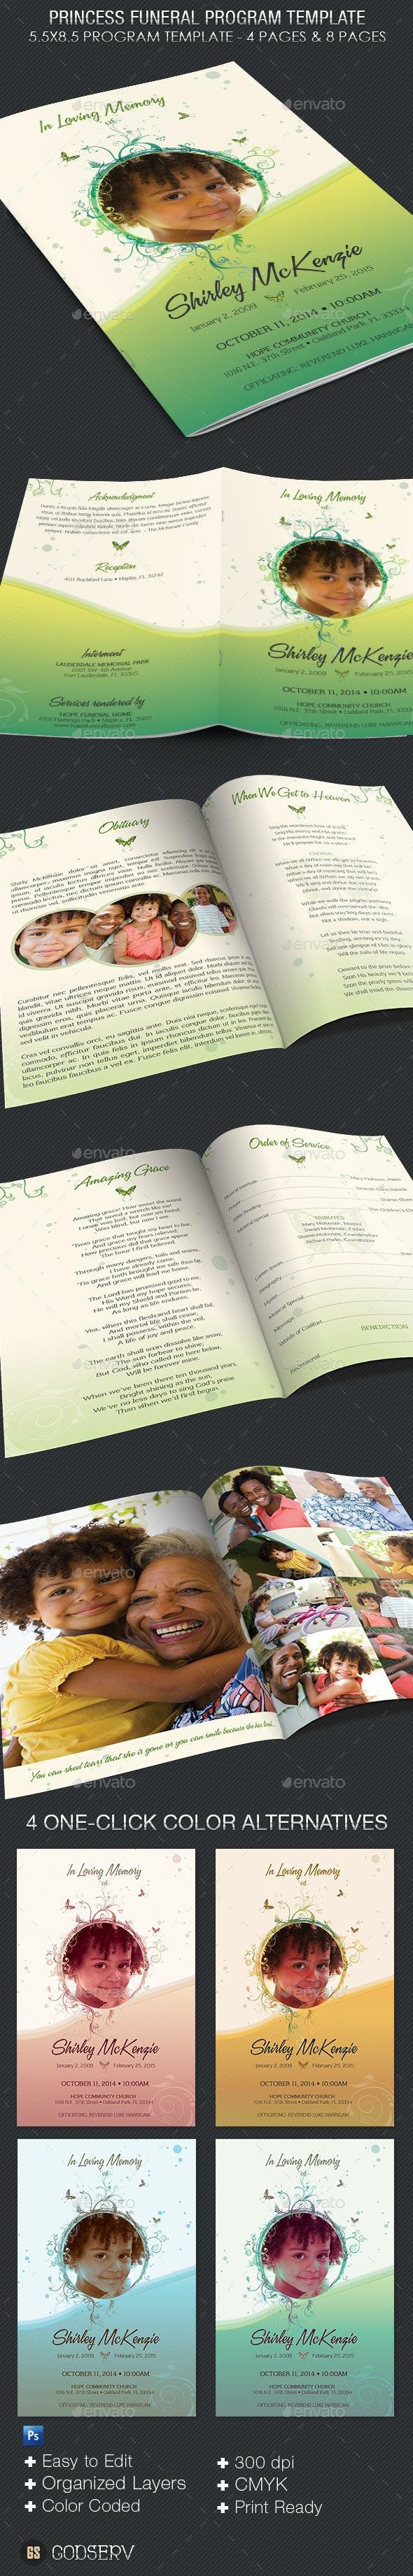 Princess Funeral Program Template - Informational Brochures